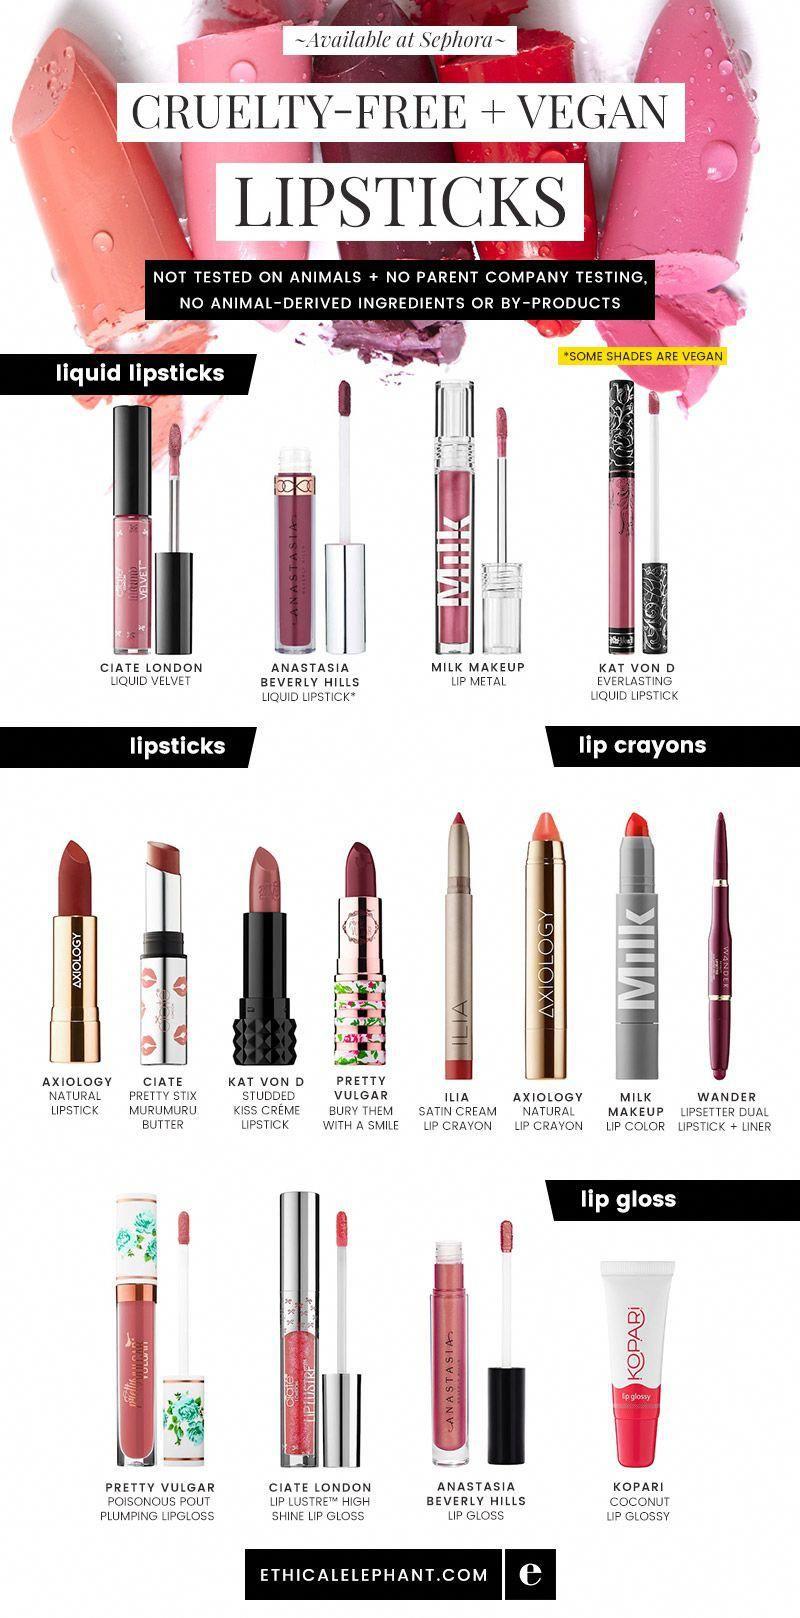 Crueltyfree and vegan lipsticks, liquid lipsticks, lip